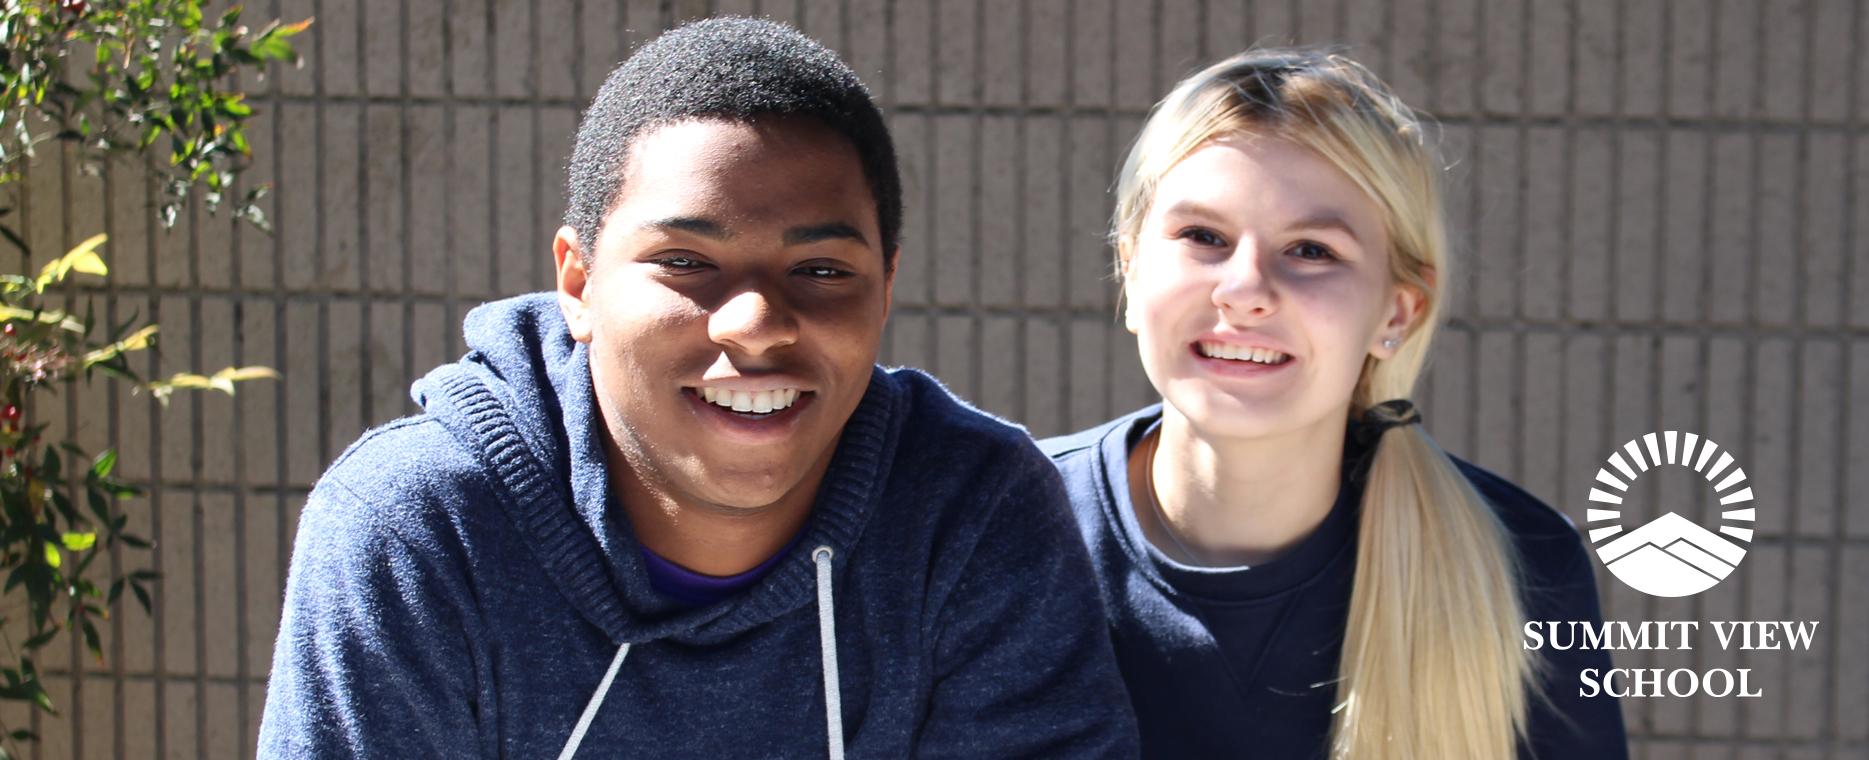 SV_Sliders2_students